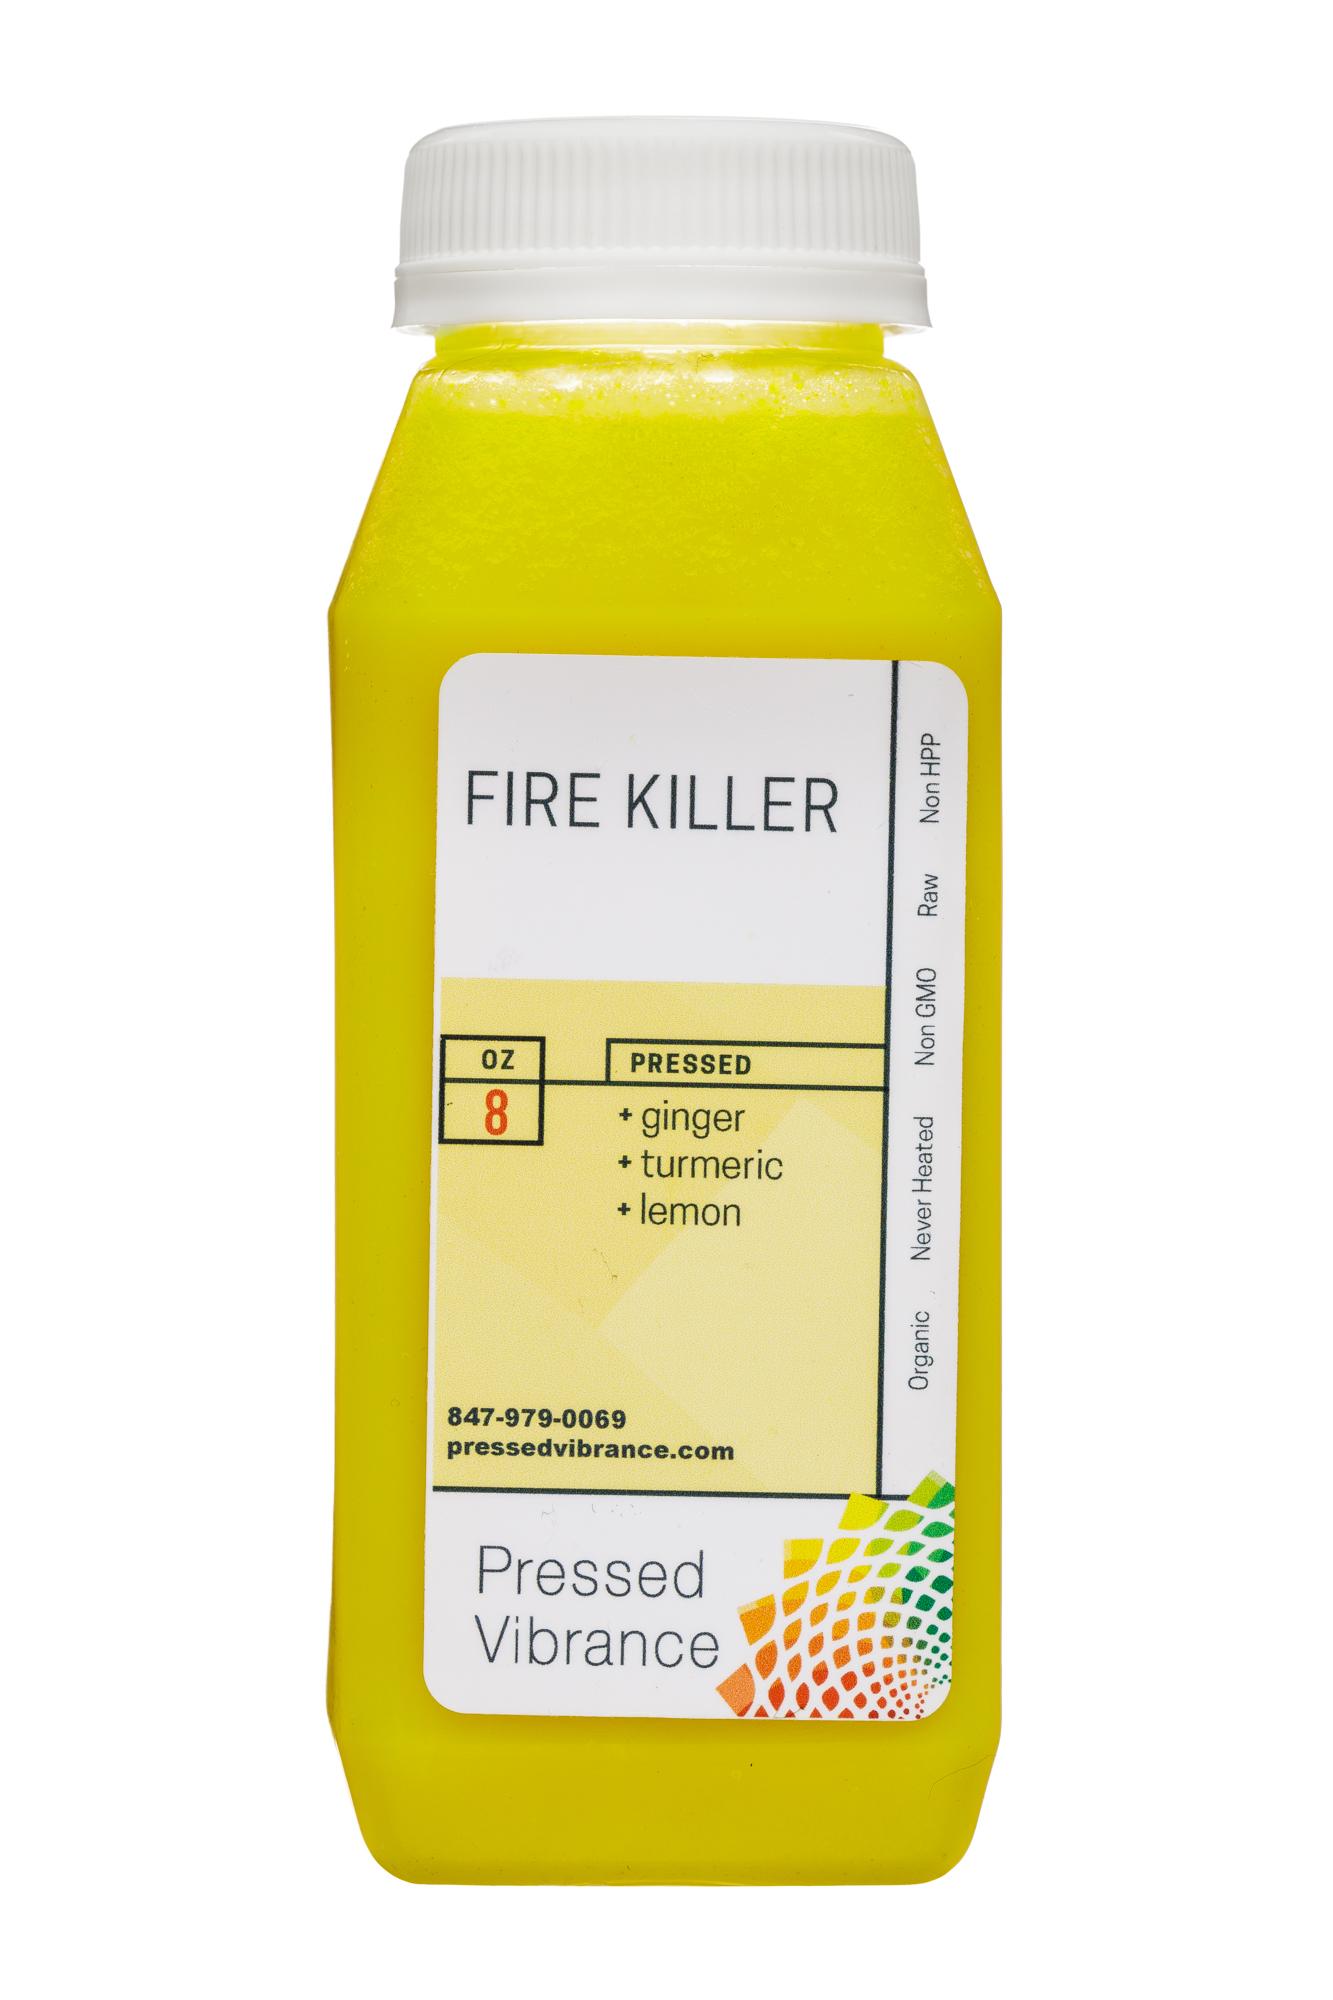 Pressed Vibrance: PressedVibrance-8oz-FireKiller